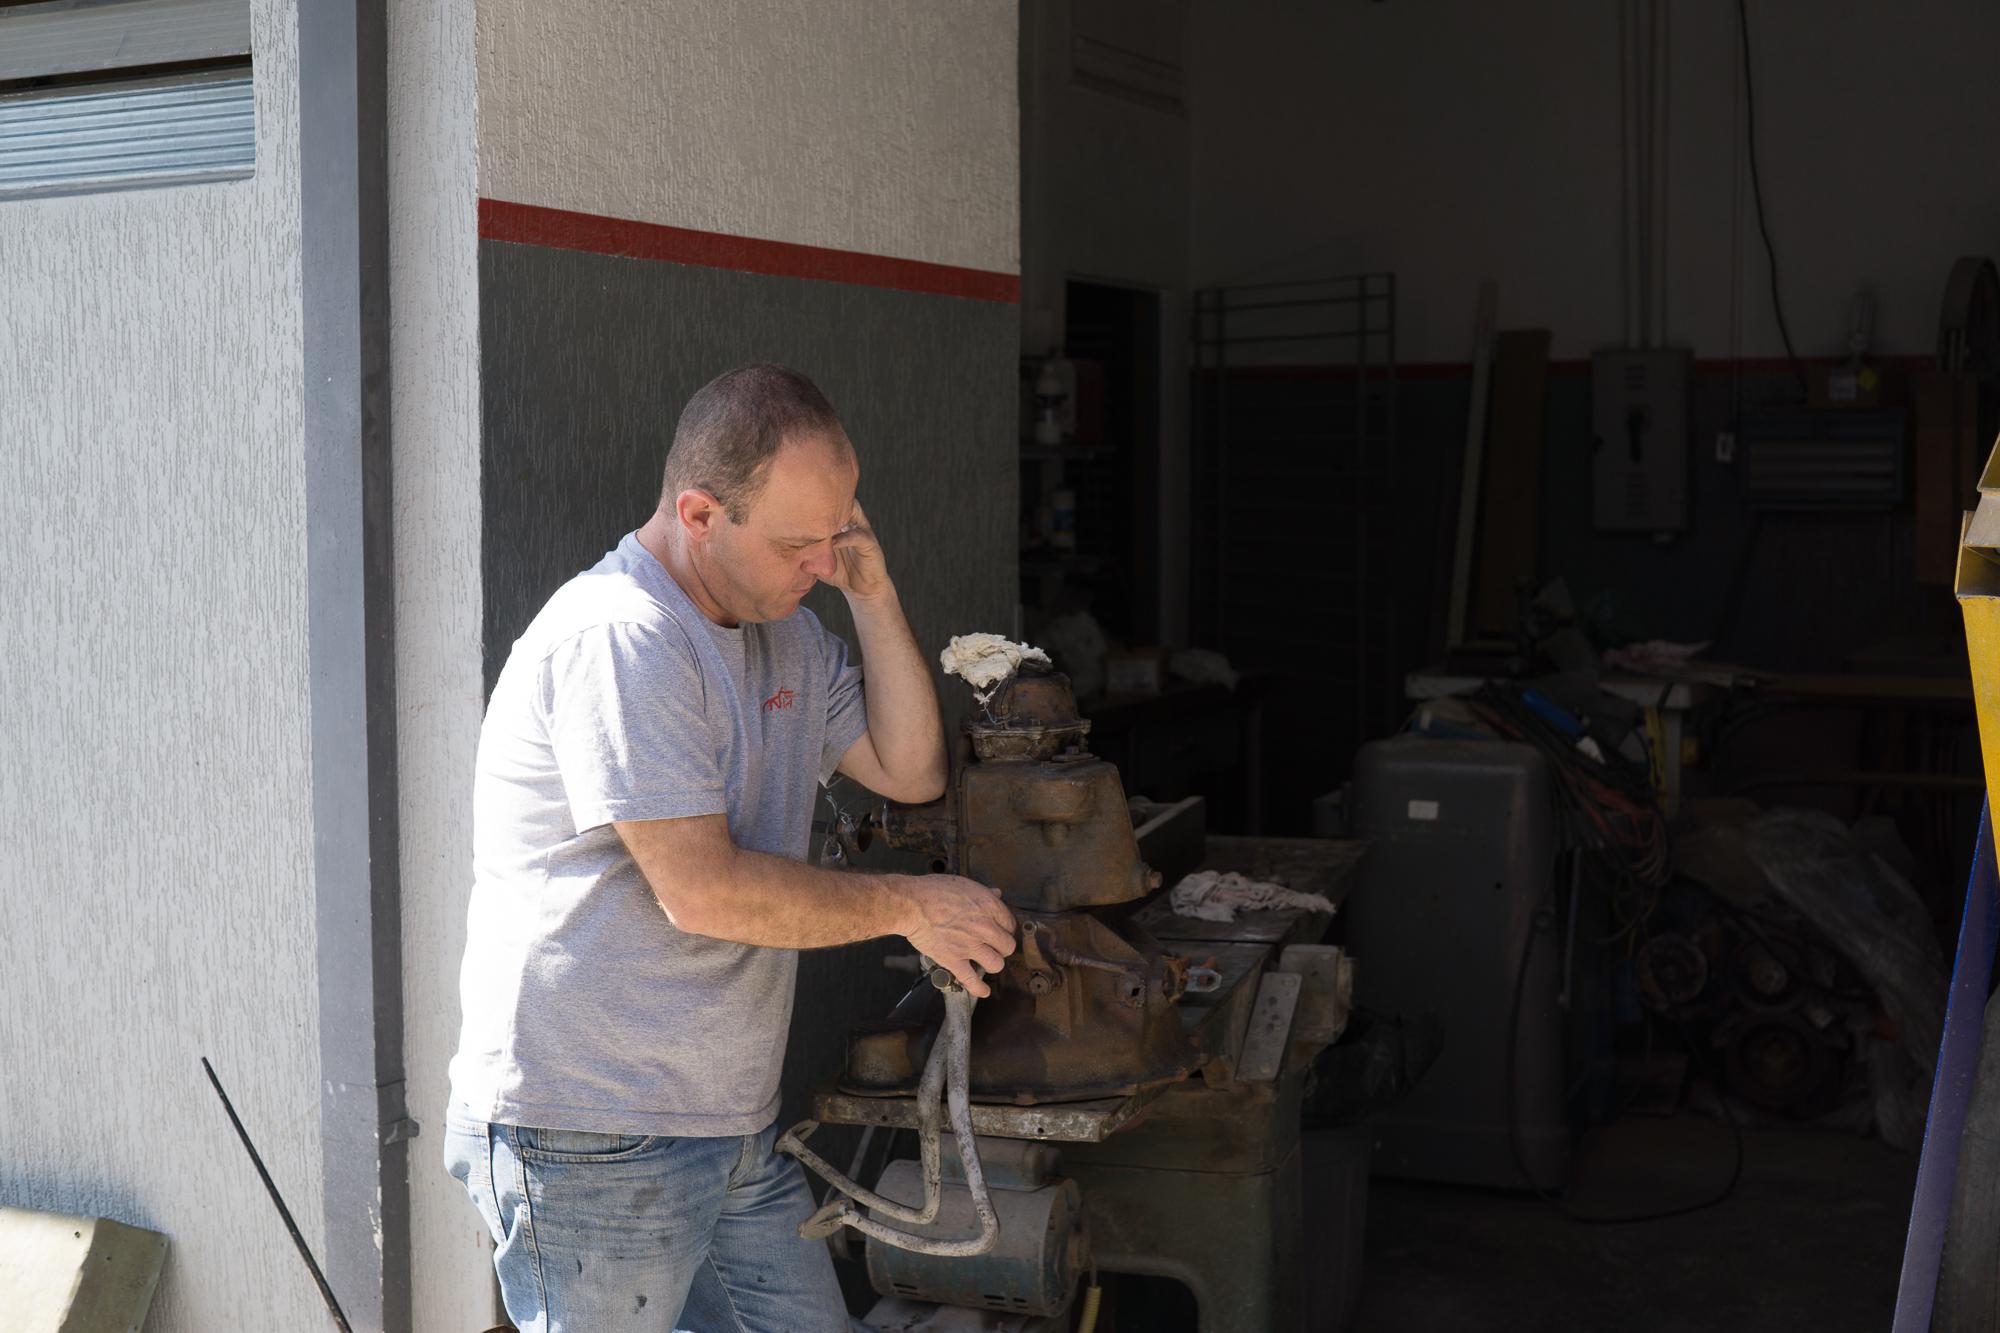 Nika on the phone next to a tool